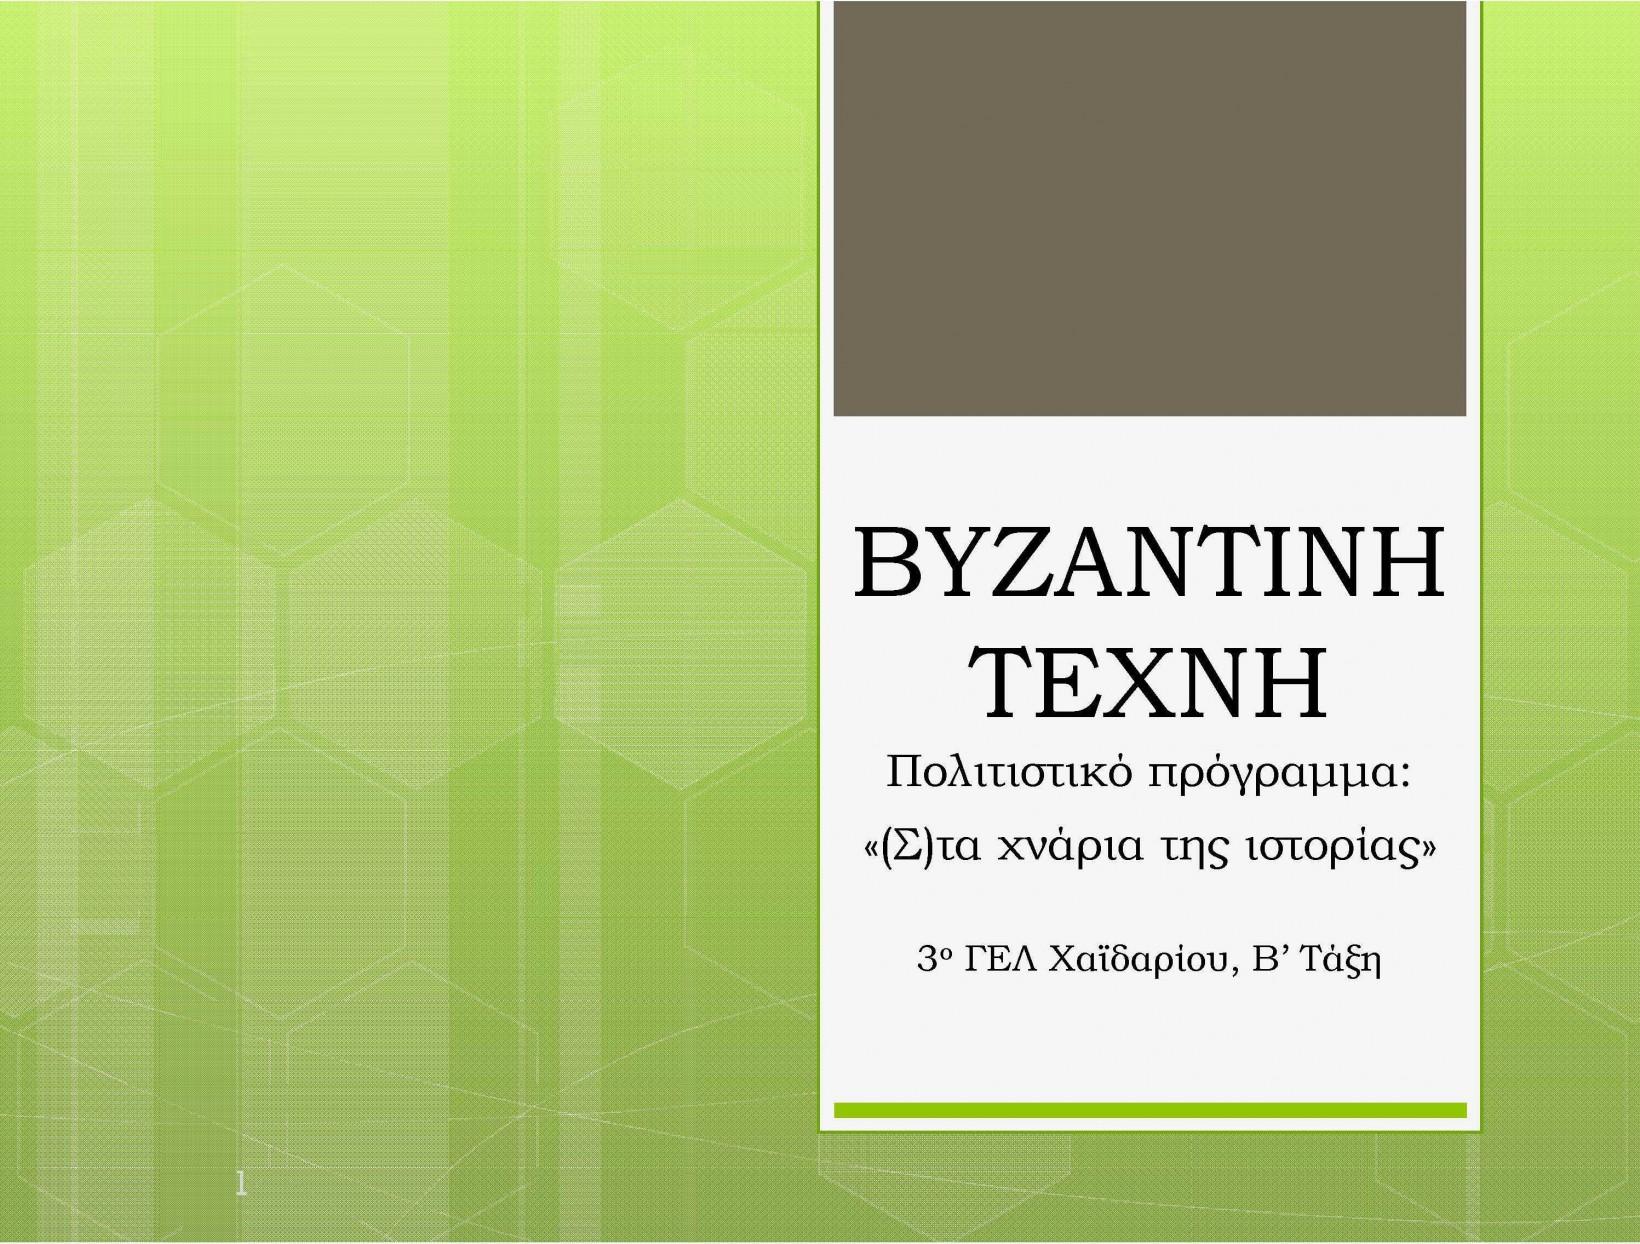 Pages from ΣΤΑ ΧΝΑΡΙΑ ΤΗΣ ΙΣΤΟΡΙΑΣ_3ο ΓΕΛ Χαϊδαριου